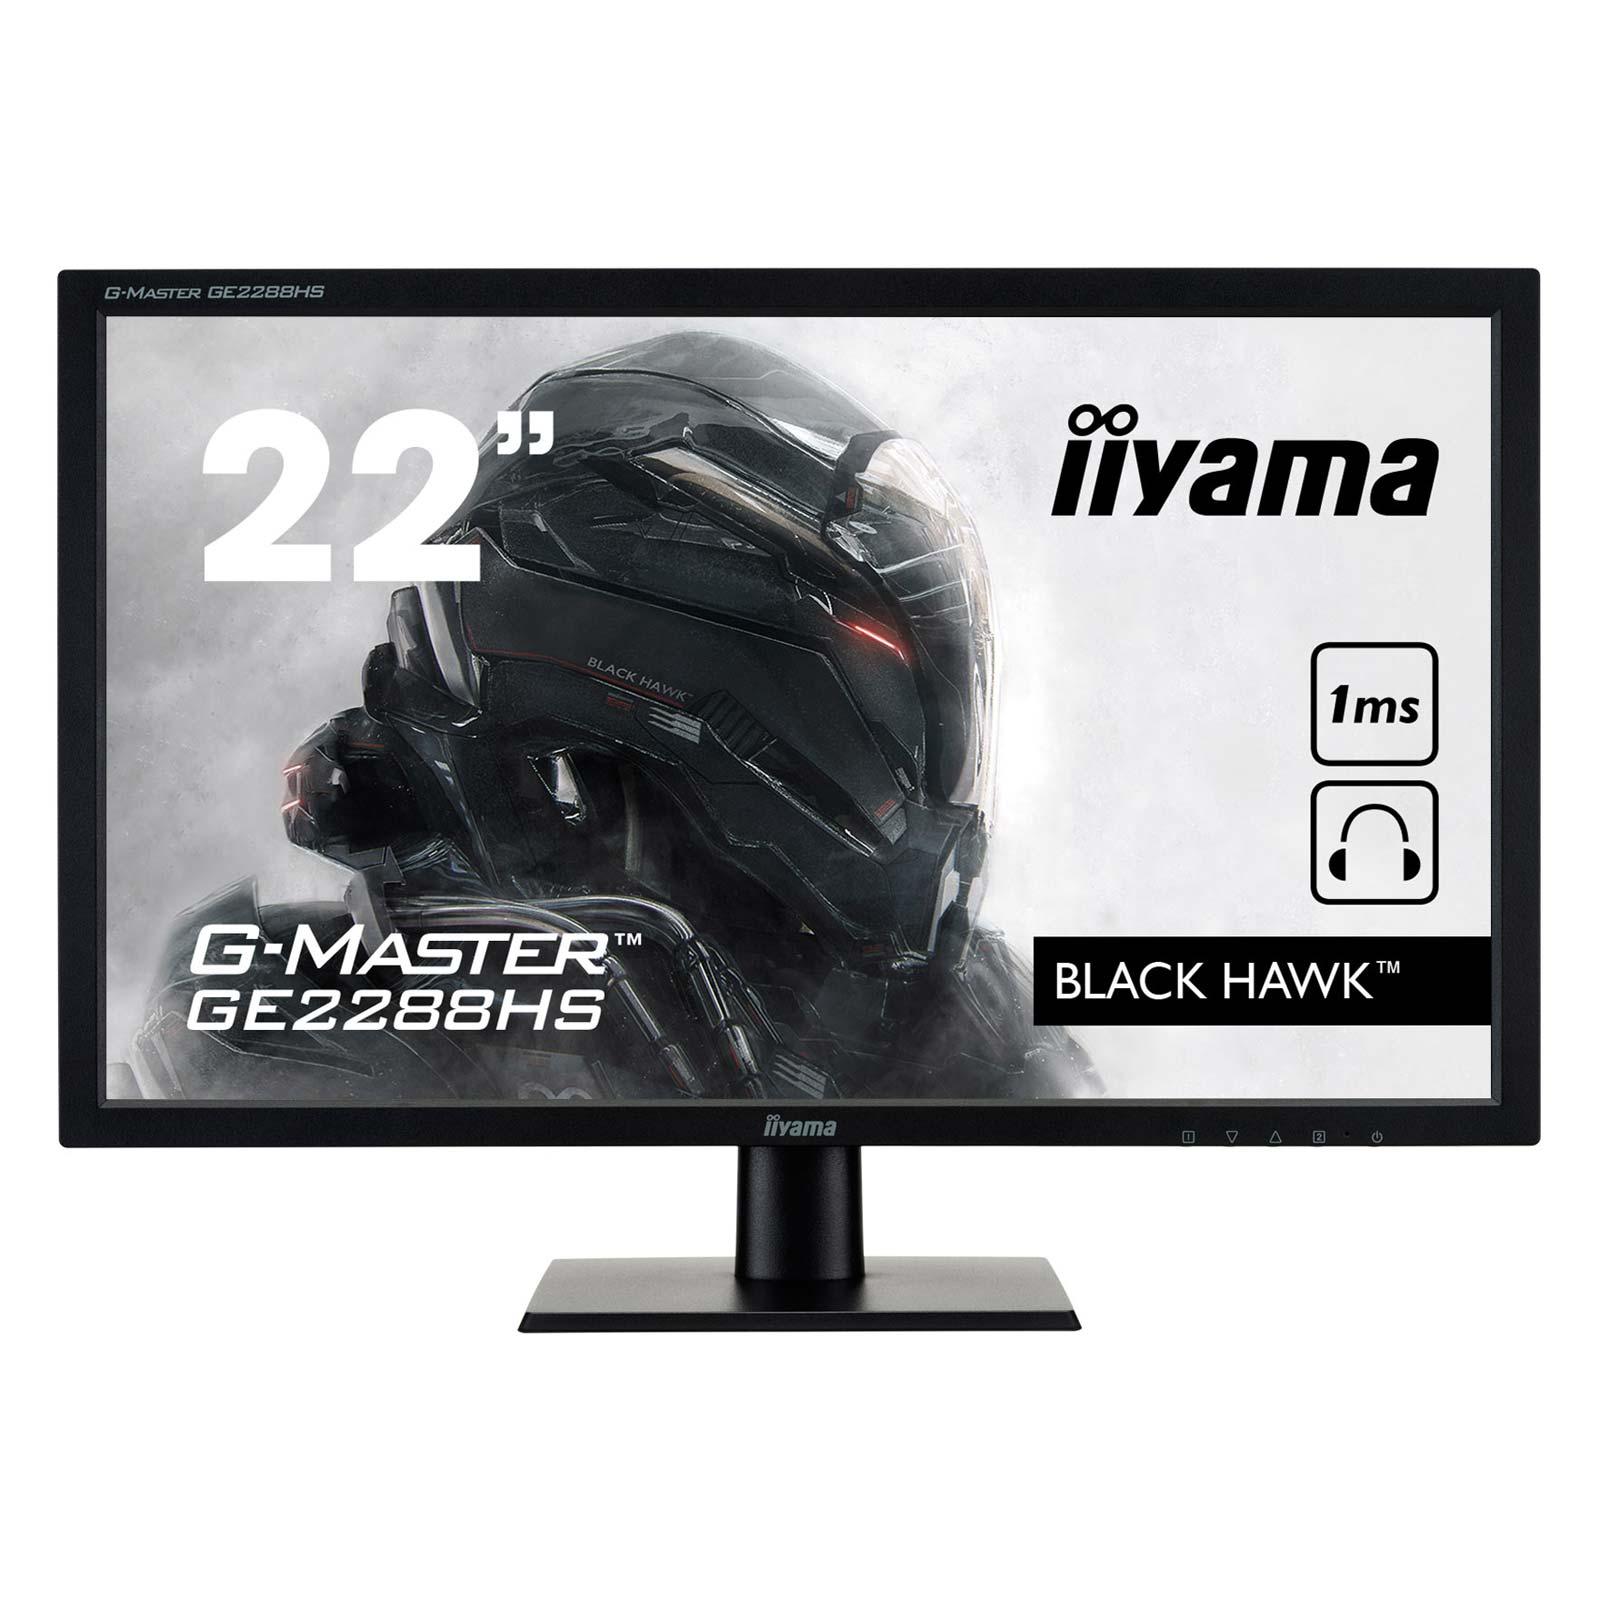 Iiyama GE2288HS-B1 G-Master Black Hawk (GE2288HS-B1) - Achat / Vente Ecran PC sur Cybertek.fr - 1